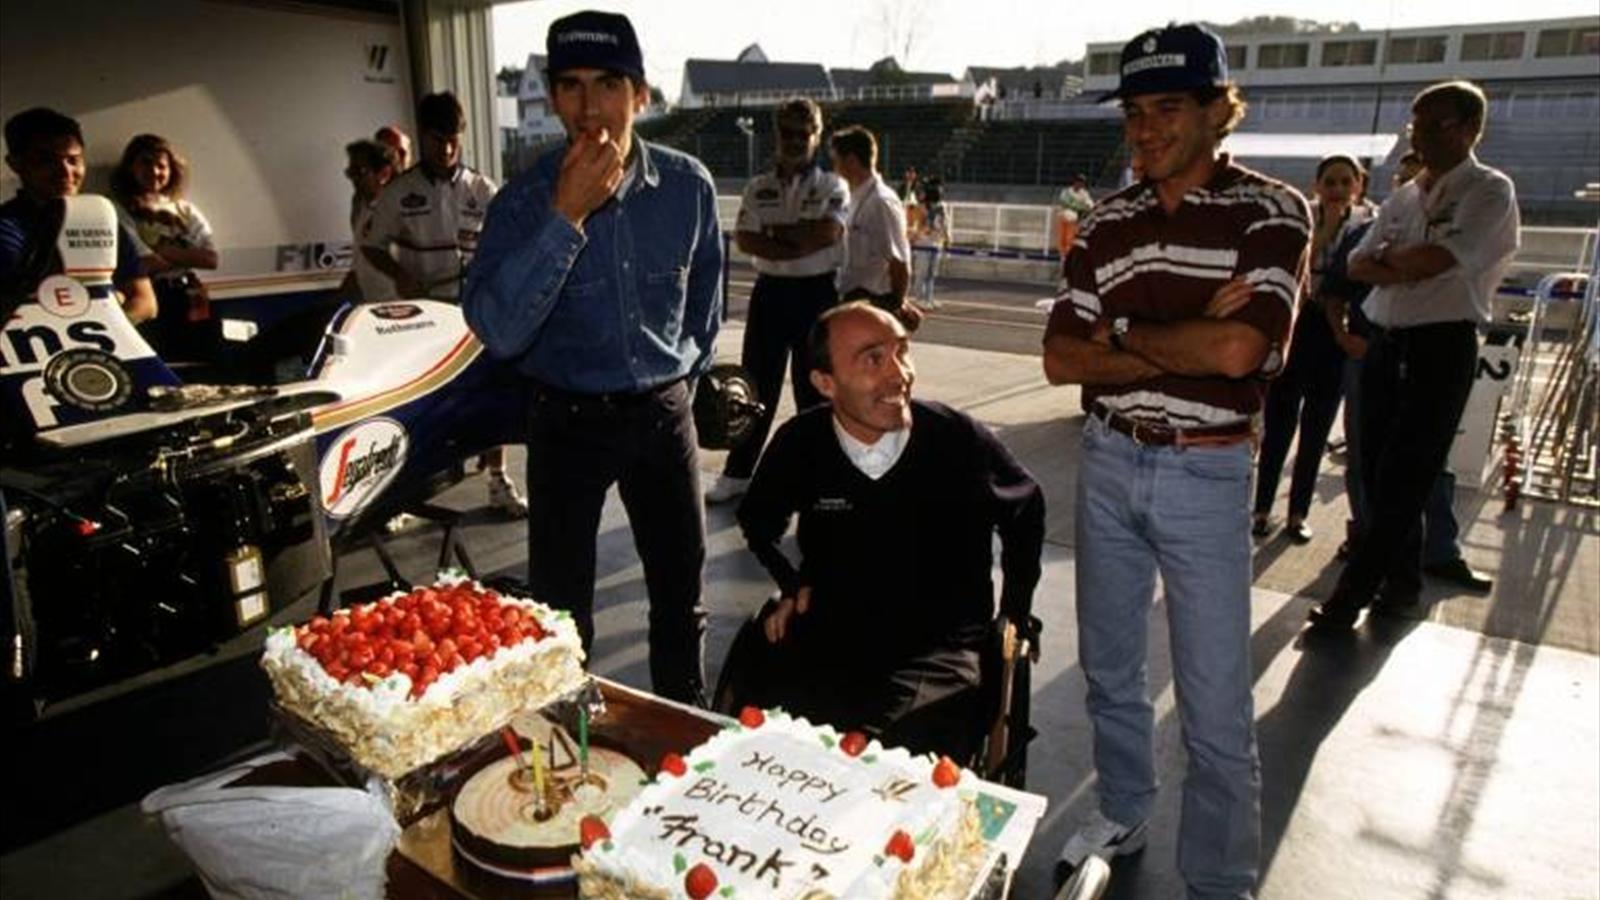 Senna's death: Hill still full of disbelief 20 years on - Formula 1 - Eurosport Australia